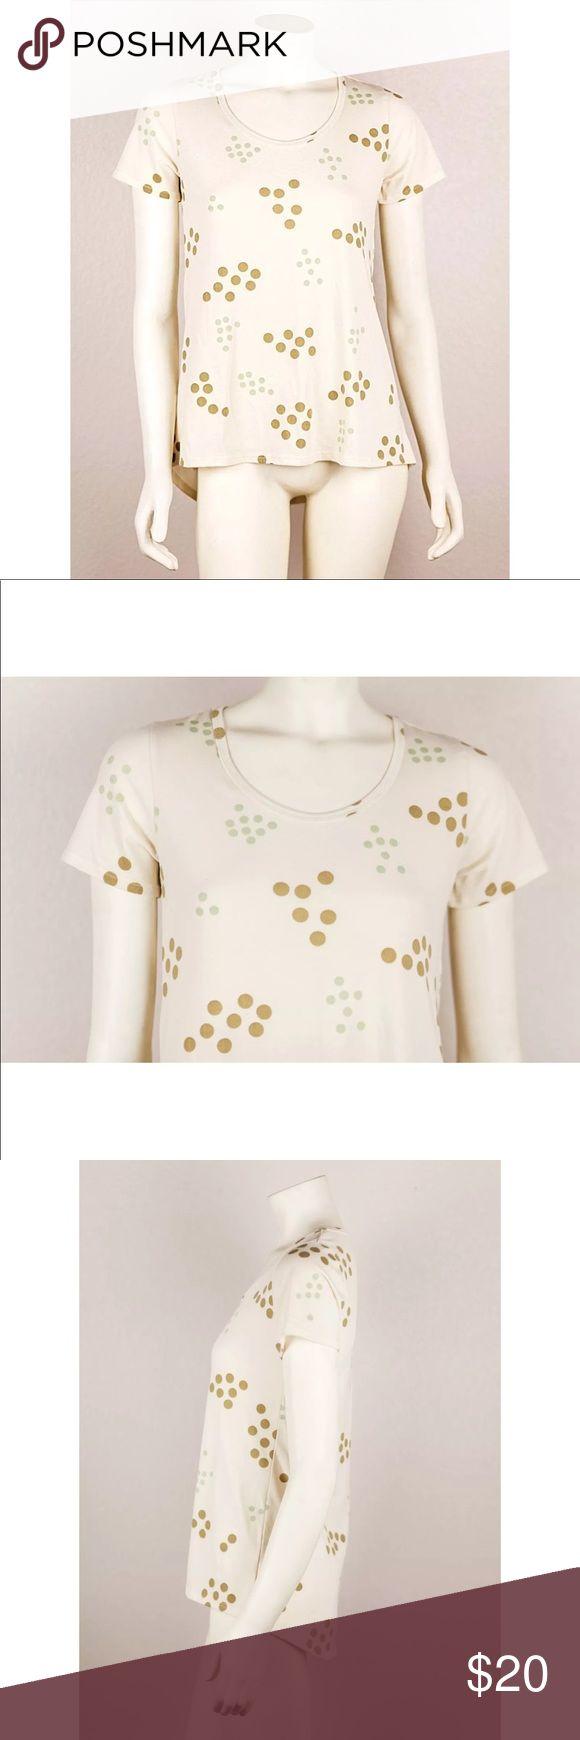 LuLaRoe Classic T-Shirt Beige Yellow Polka Dot LuLaRoe Classic T-Shirt Beige Yellow Green Polka Dot Short Sleeve Tee Size XXS. Minimal piling  Bust: 17.5  Waist: 18  Length: 25 LuLaRoe Tops Tees - Short Sleeve